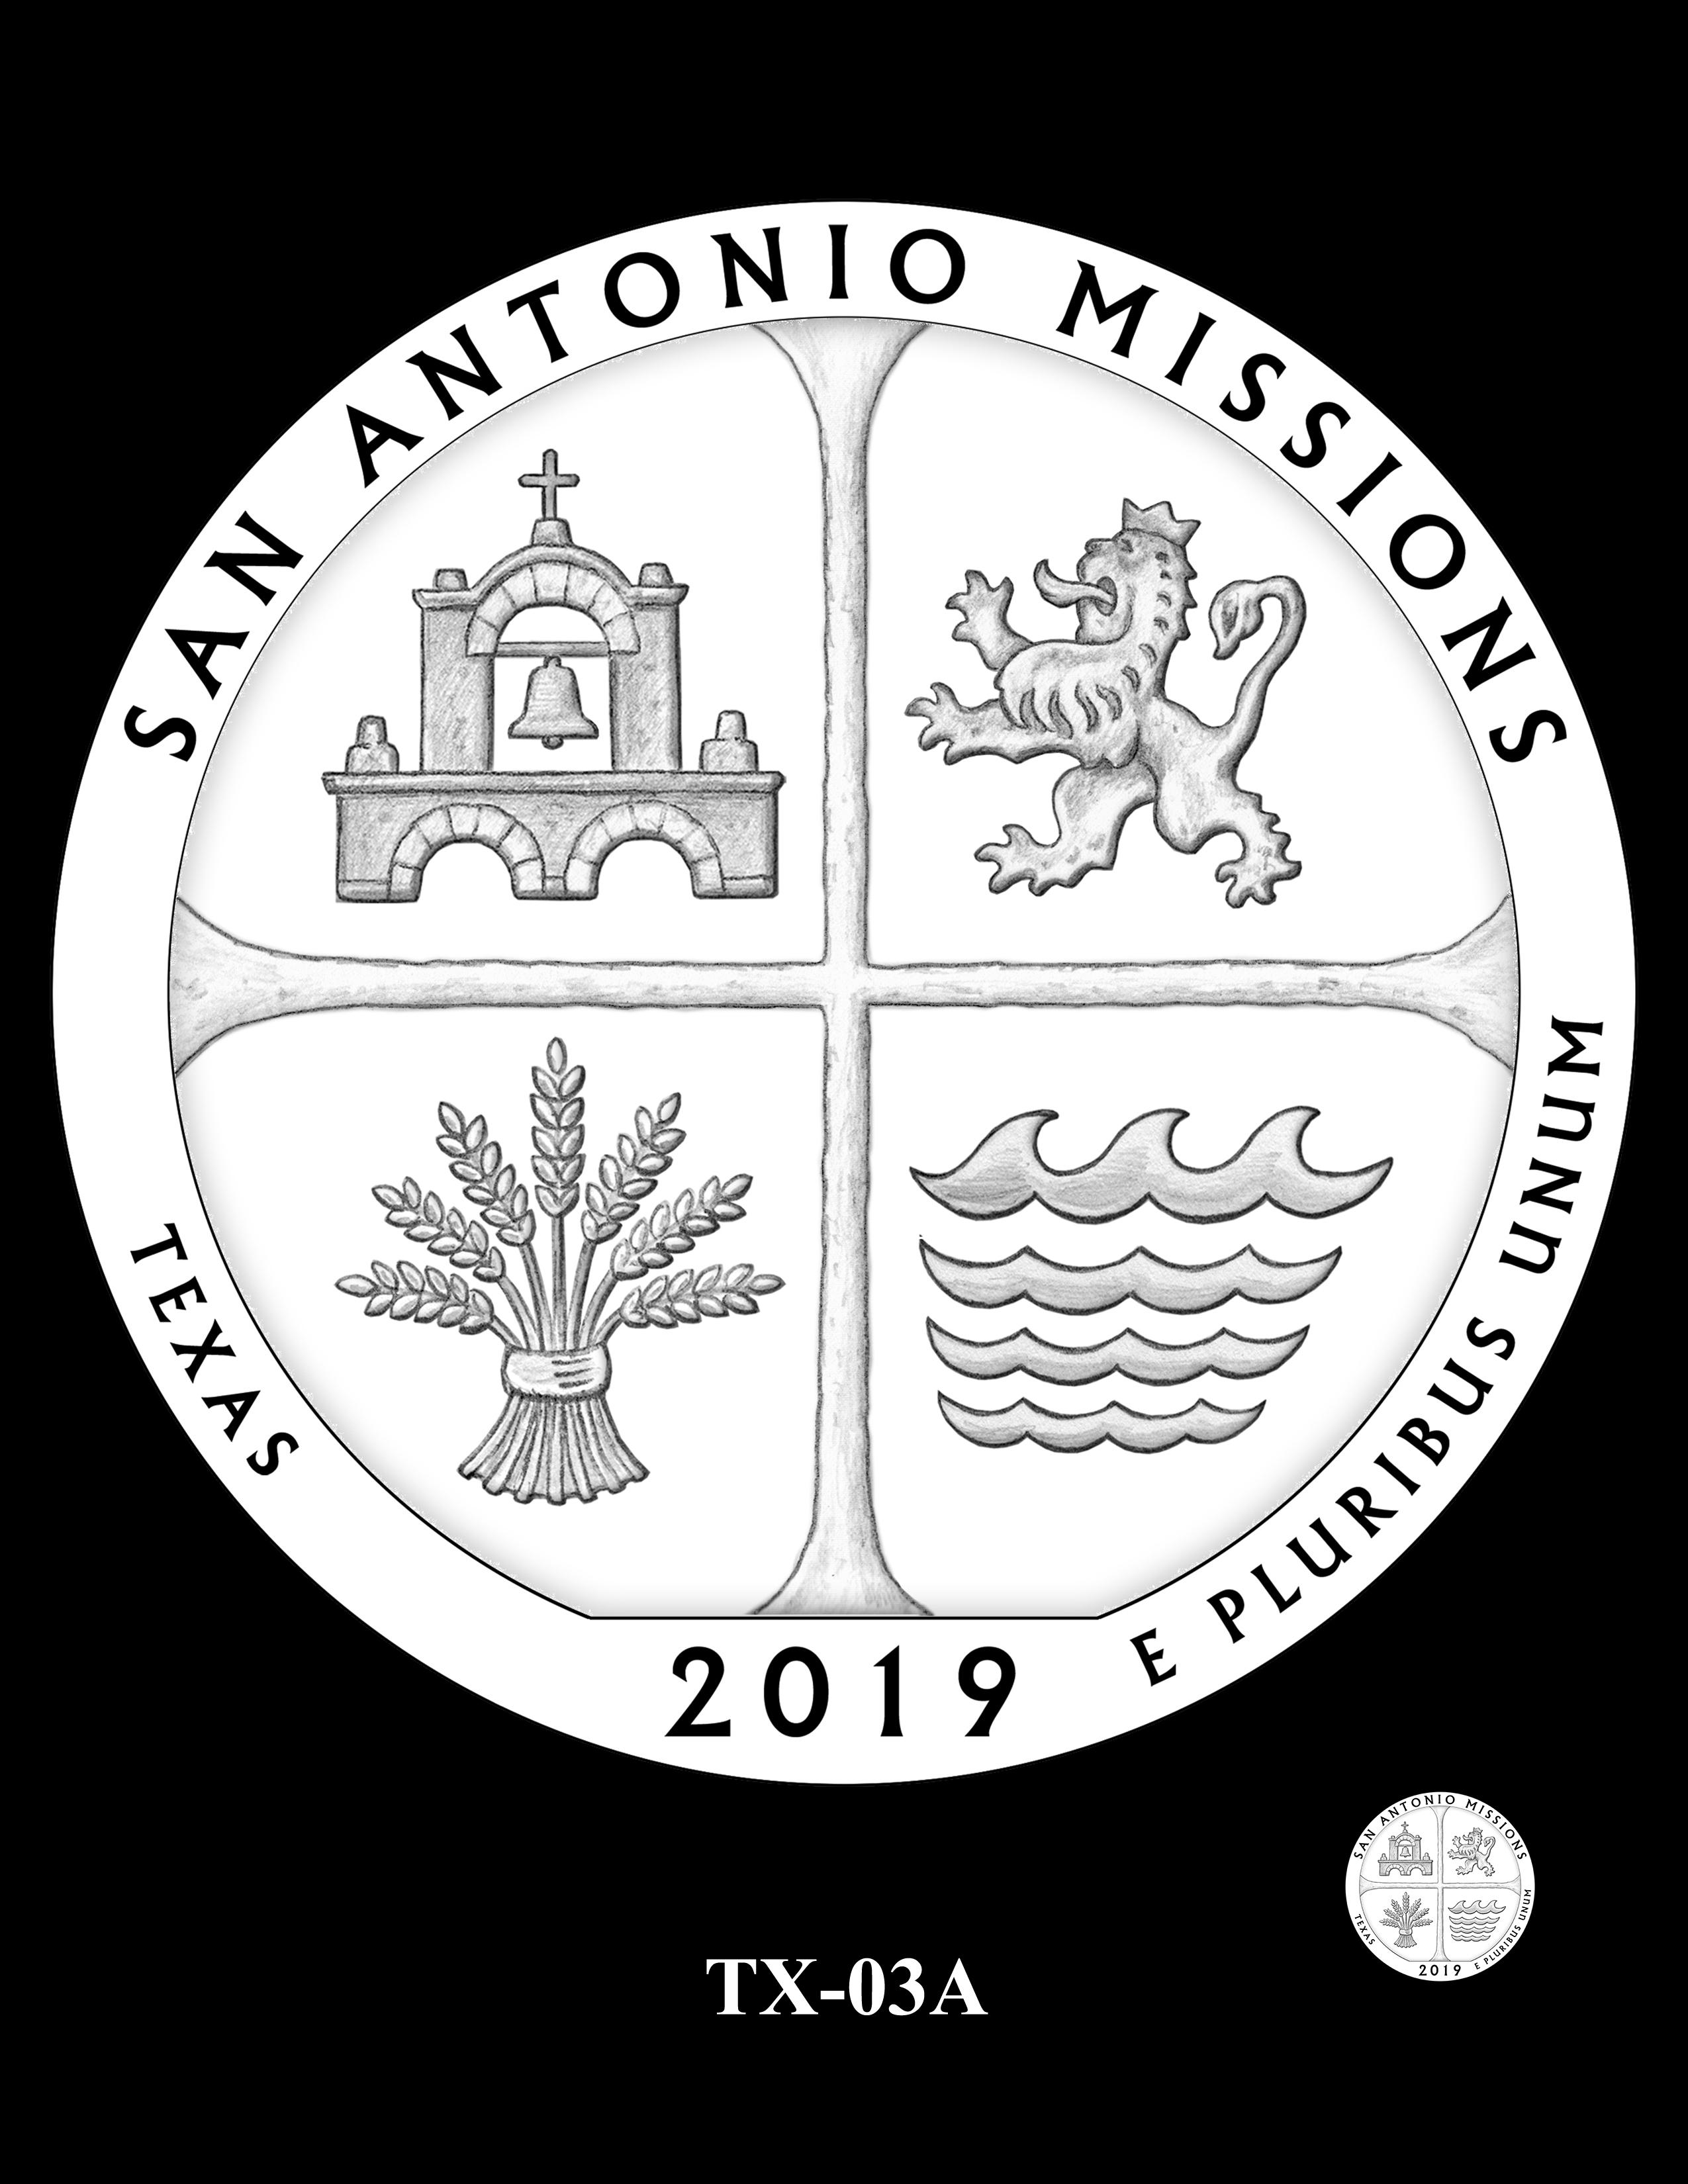 TX-03A -- 2019 America the Beautiful Quarters® Program